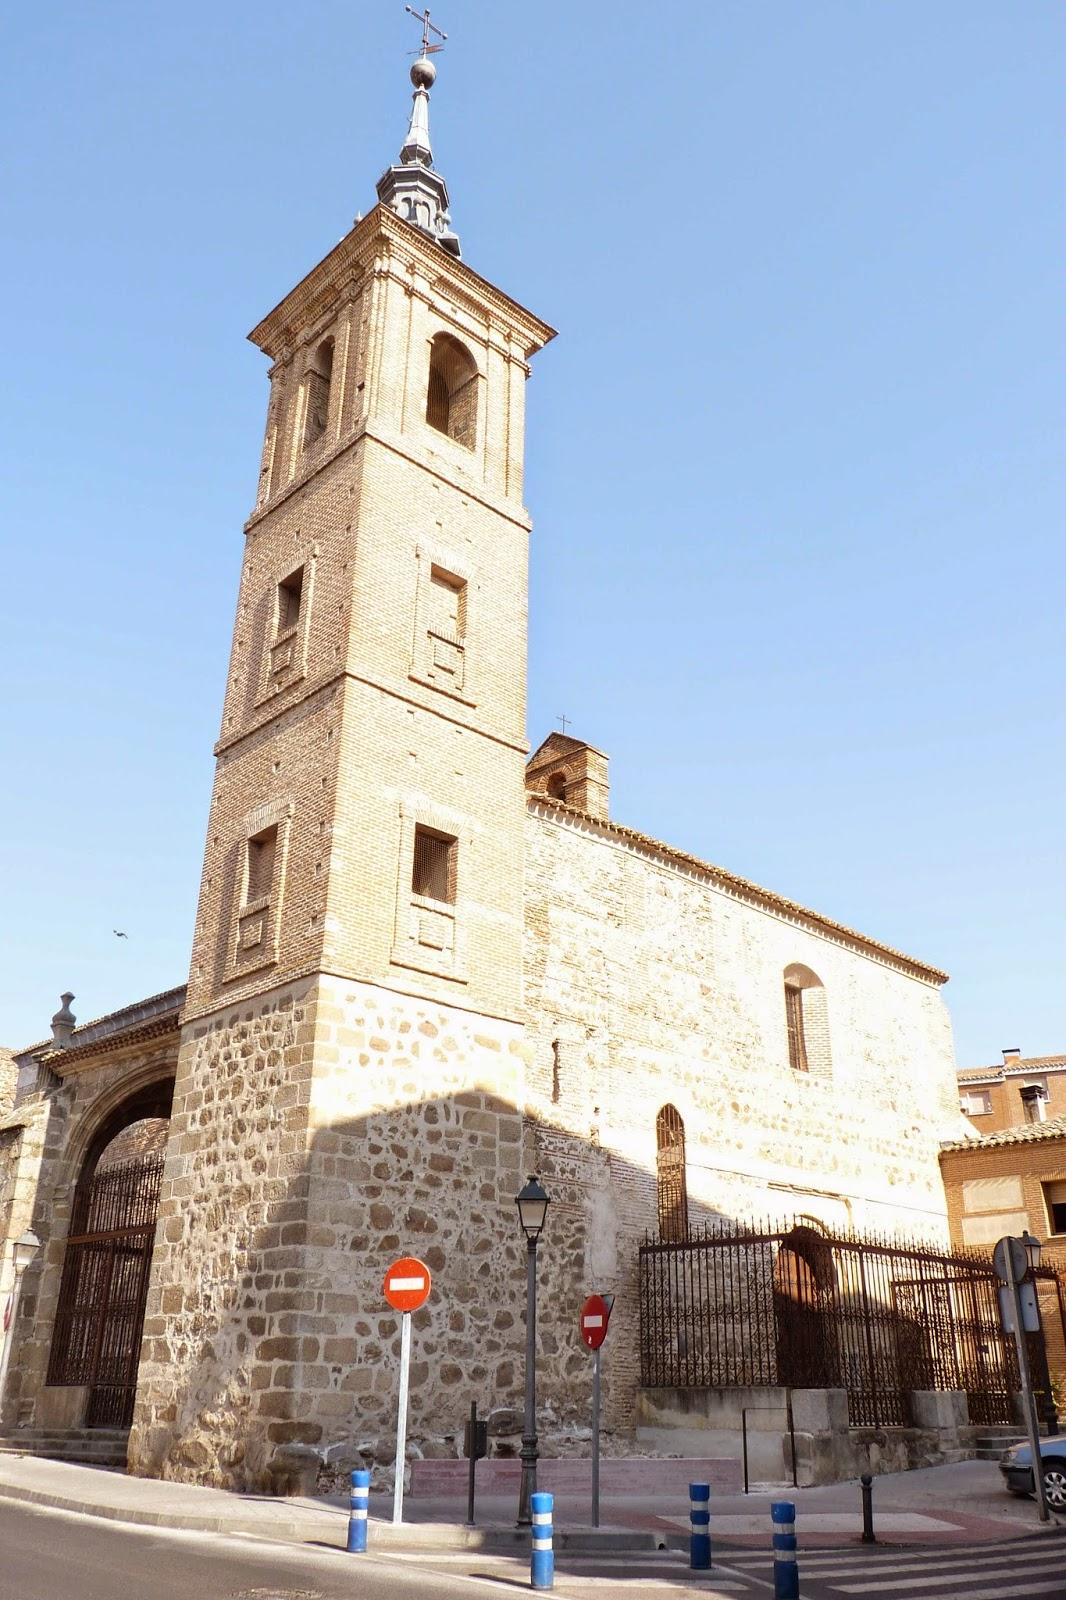 La iglesia del El Salvador en Talavera de la Reina.